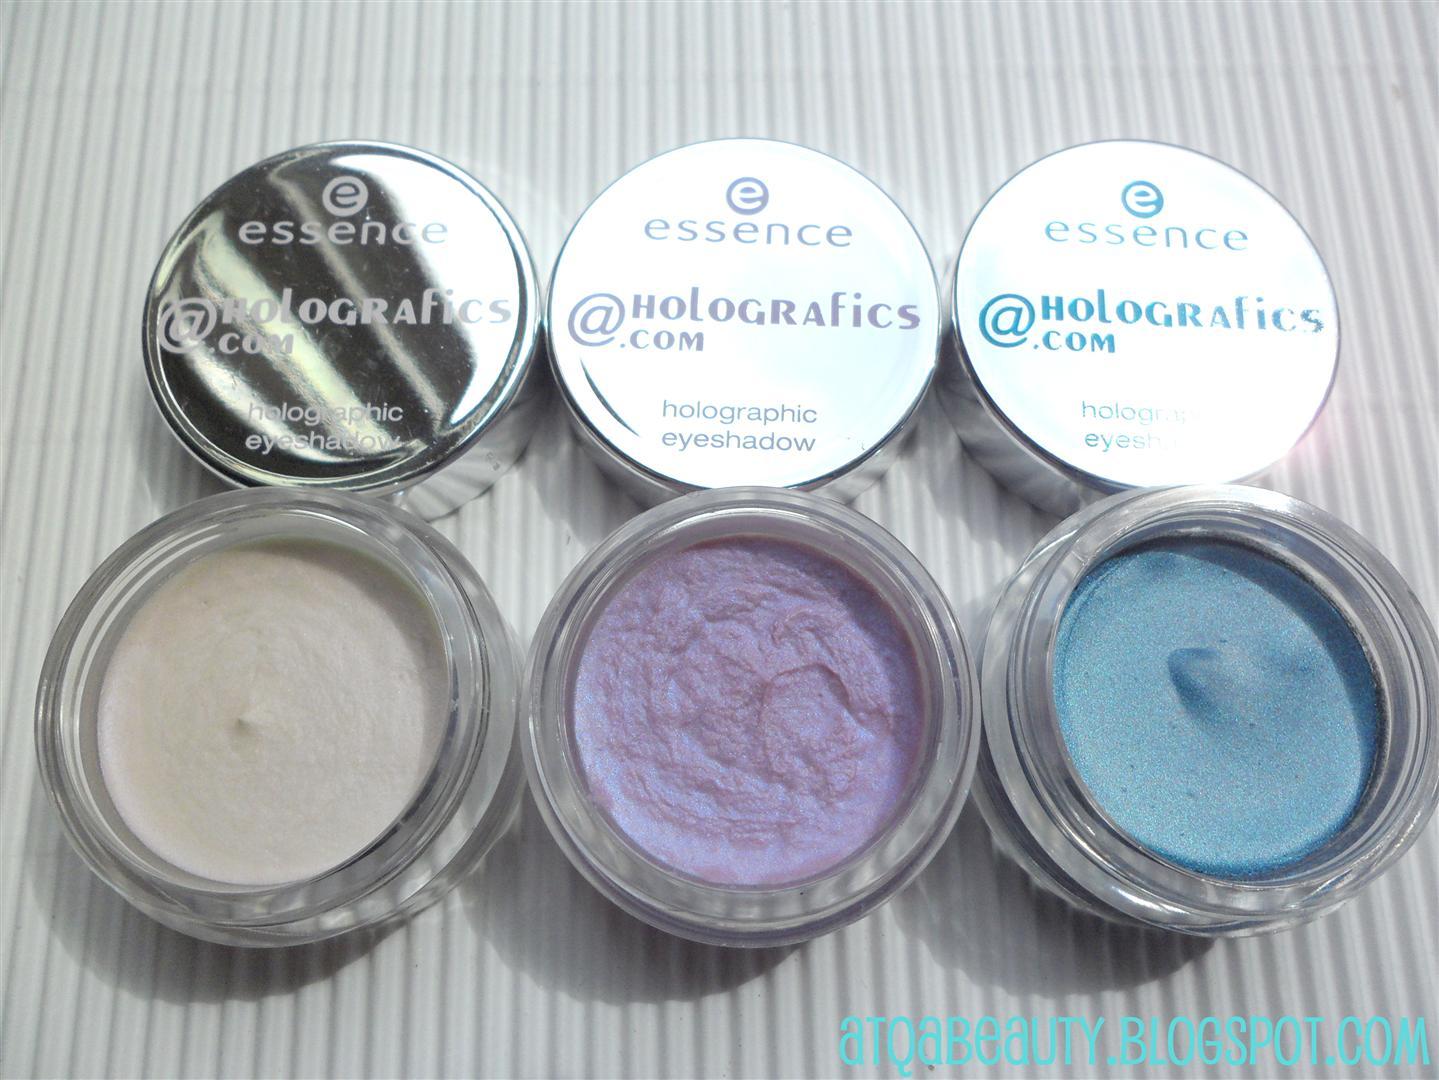 "Makijaż :: Essence ""meet_me@holografics.com"" – holograficzne cienie"